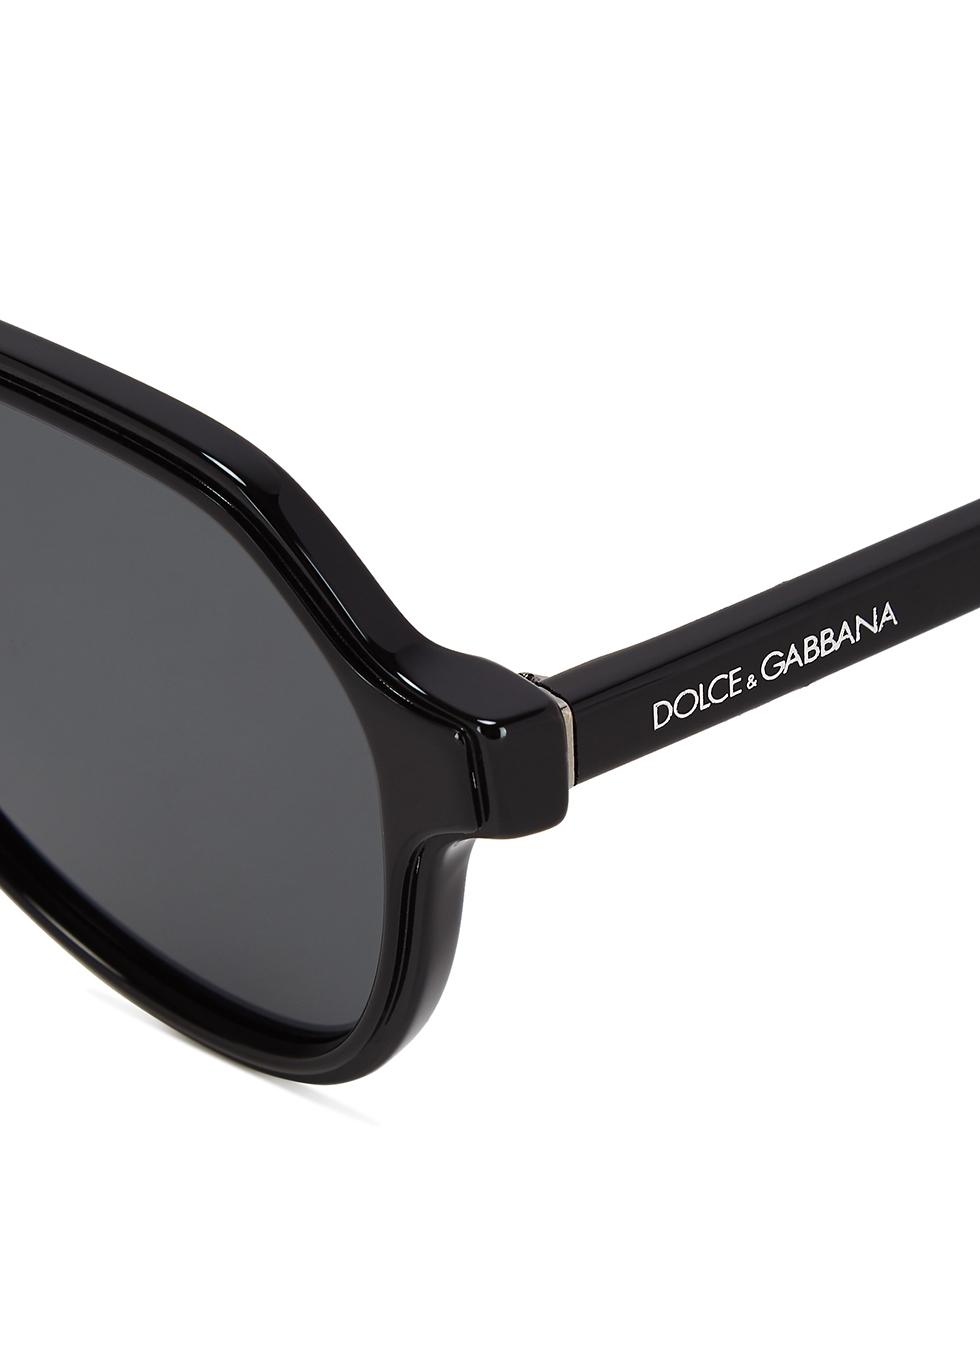 Black aviator-style sunglasses - Dolce & Gabbana